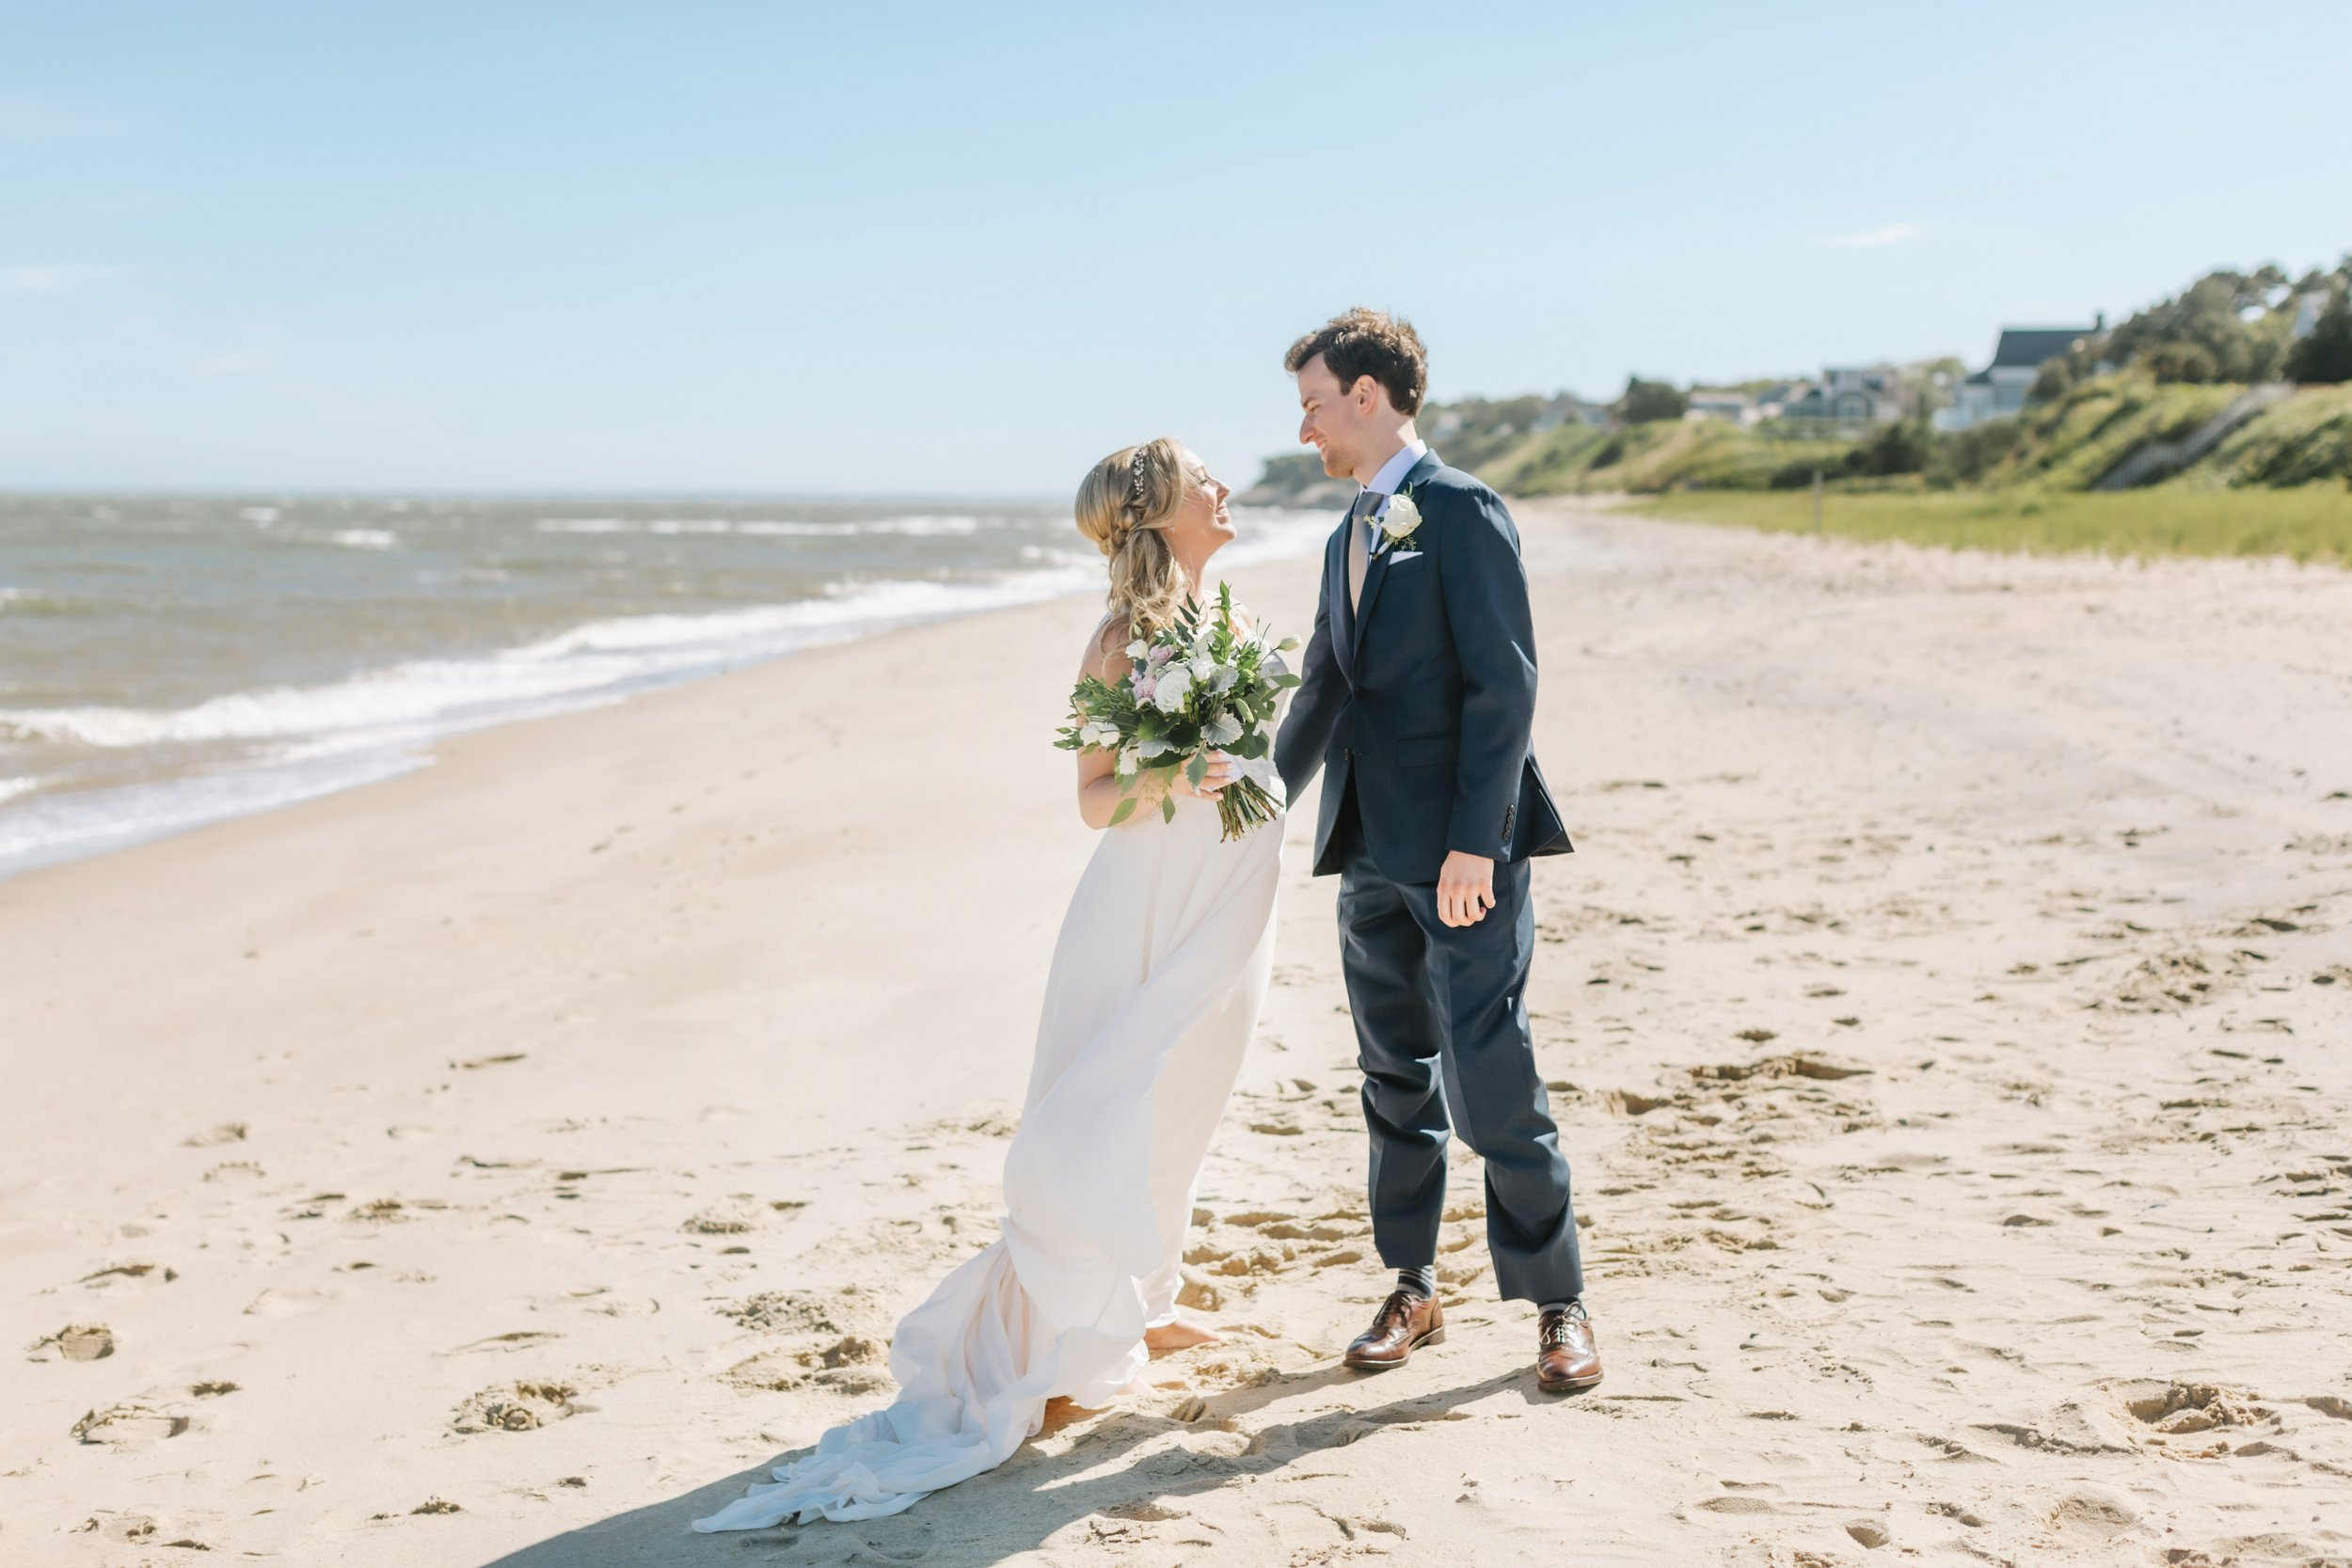 Popponesset-Inn-Wedding-Cape-Cod-Lena-Mirisola-Photography-19.jpg